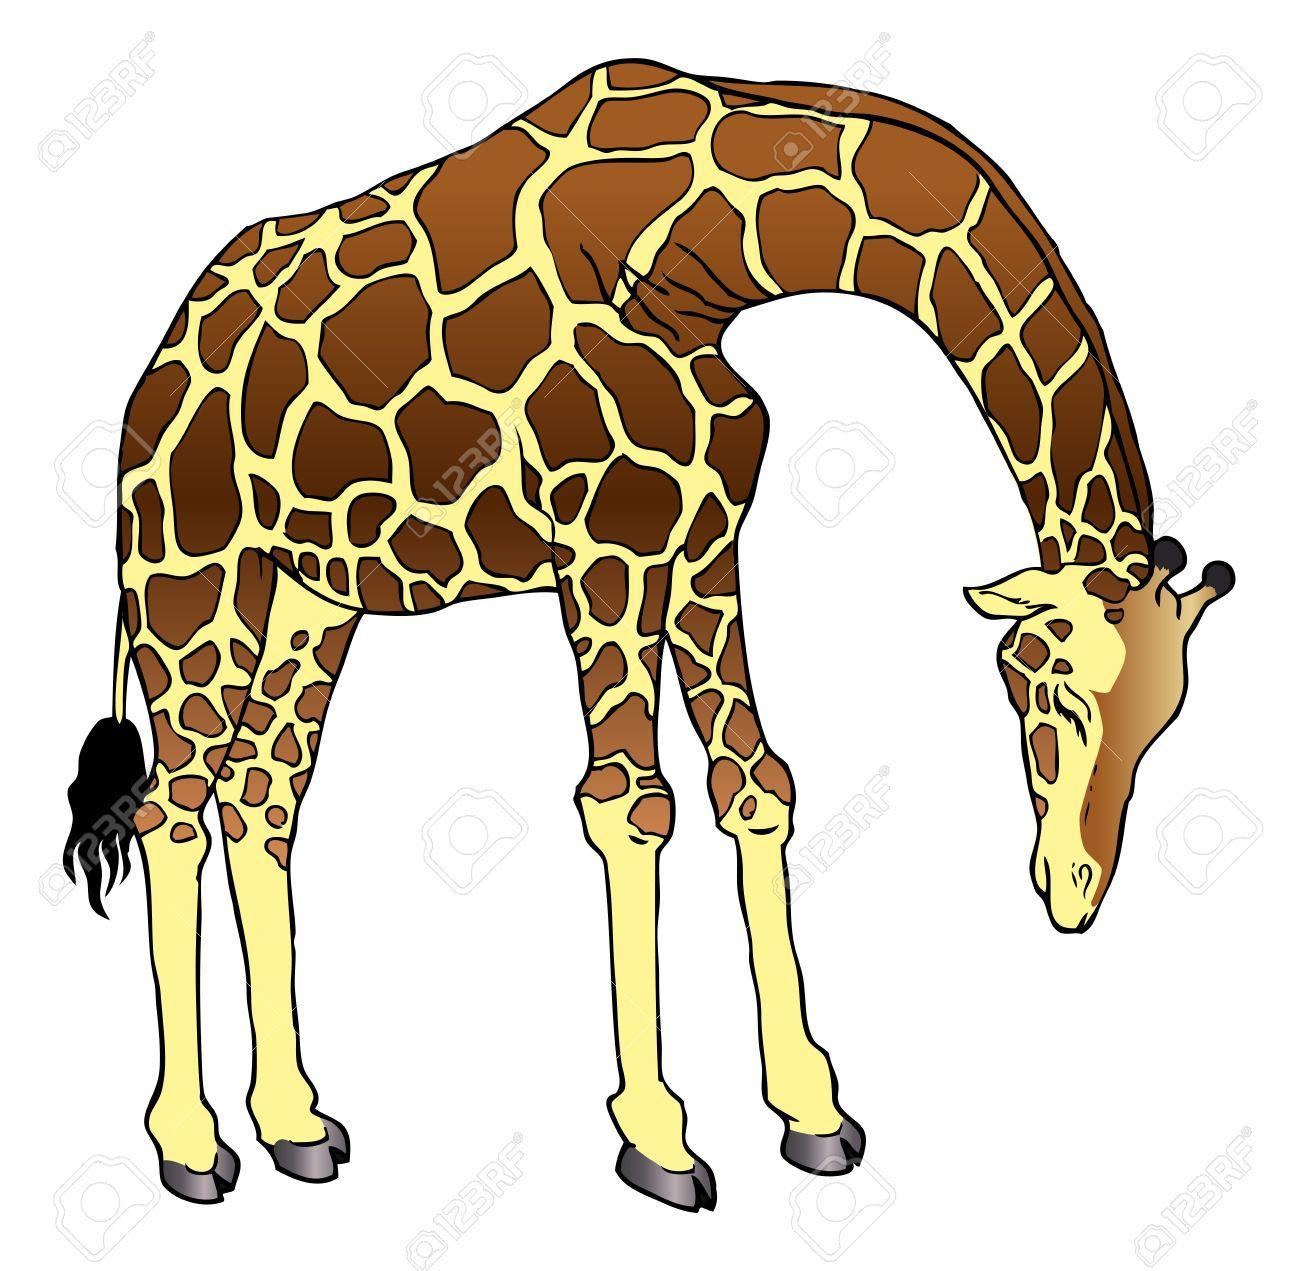 1300x1271 Cartoon Drawing Of A Giraffe Cartoon Giraffe Clipart Free